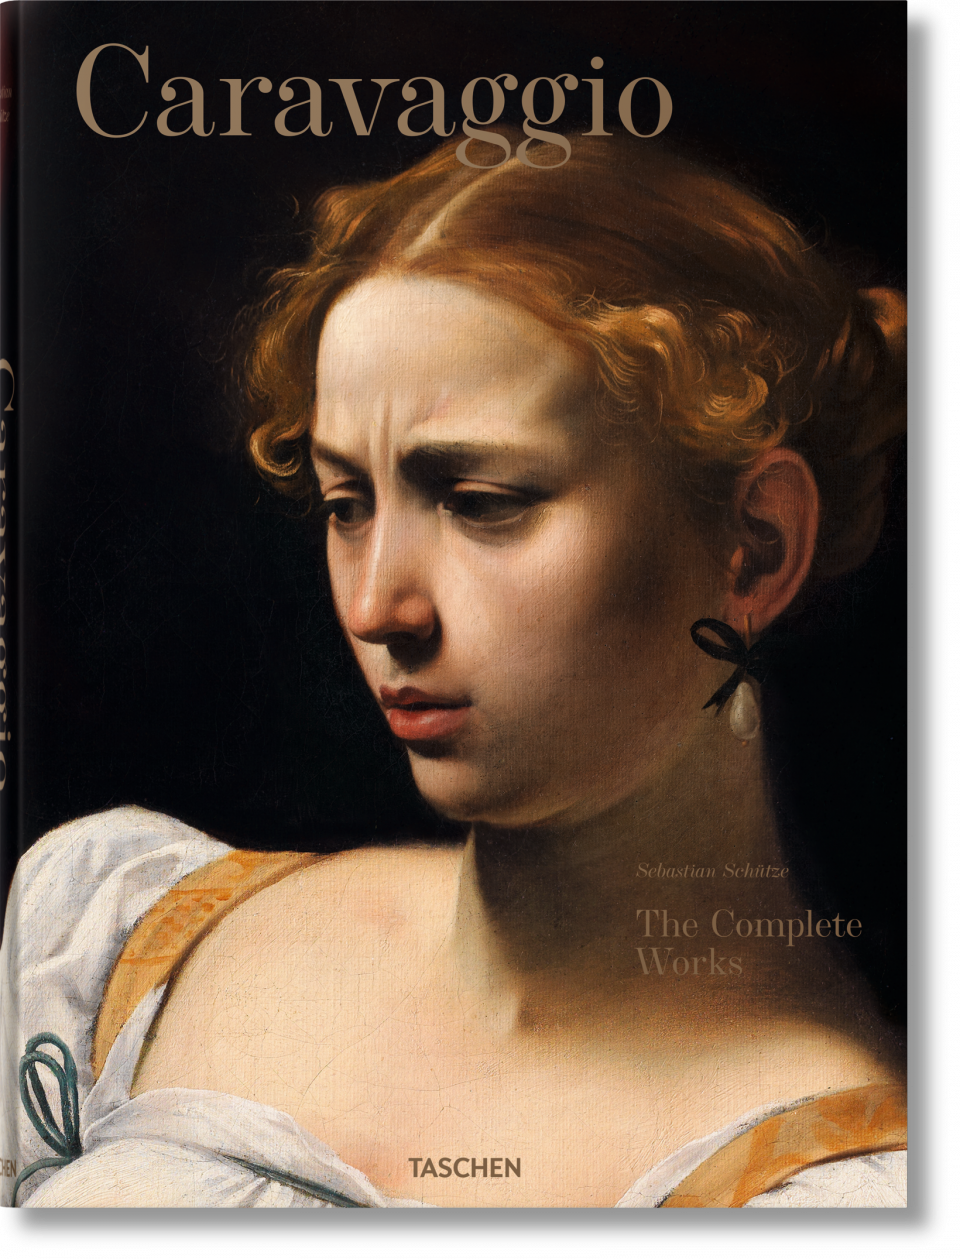 Caravaggio: Complete Works by Sebastian Schutze